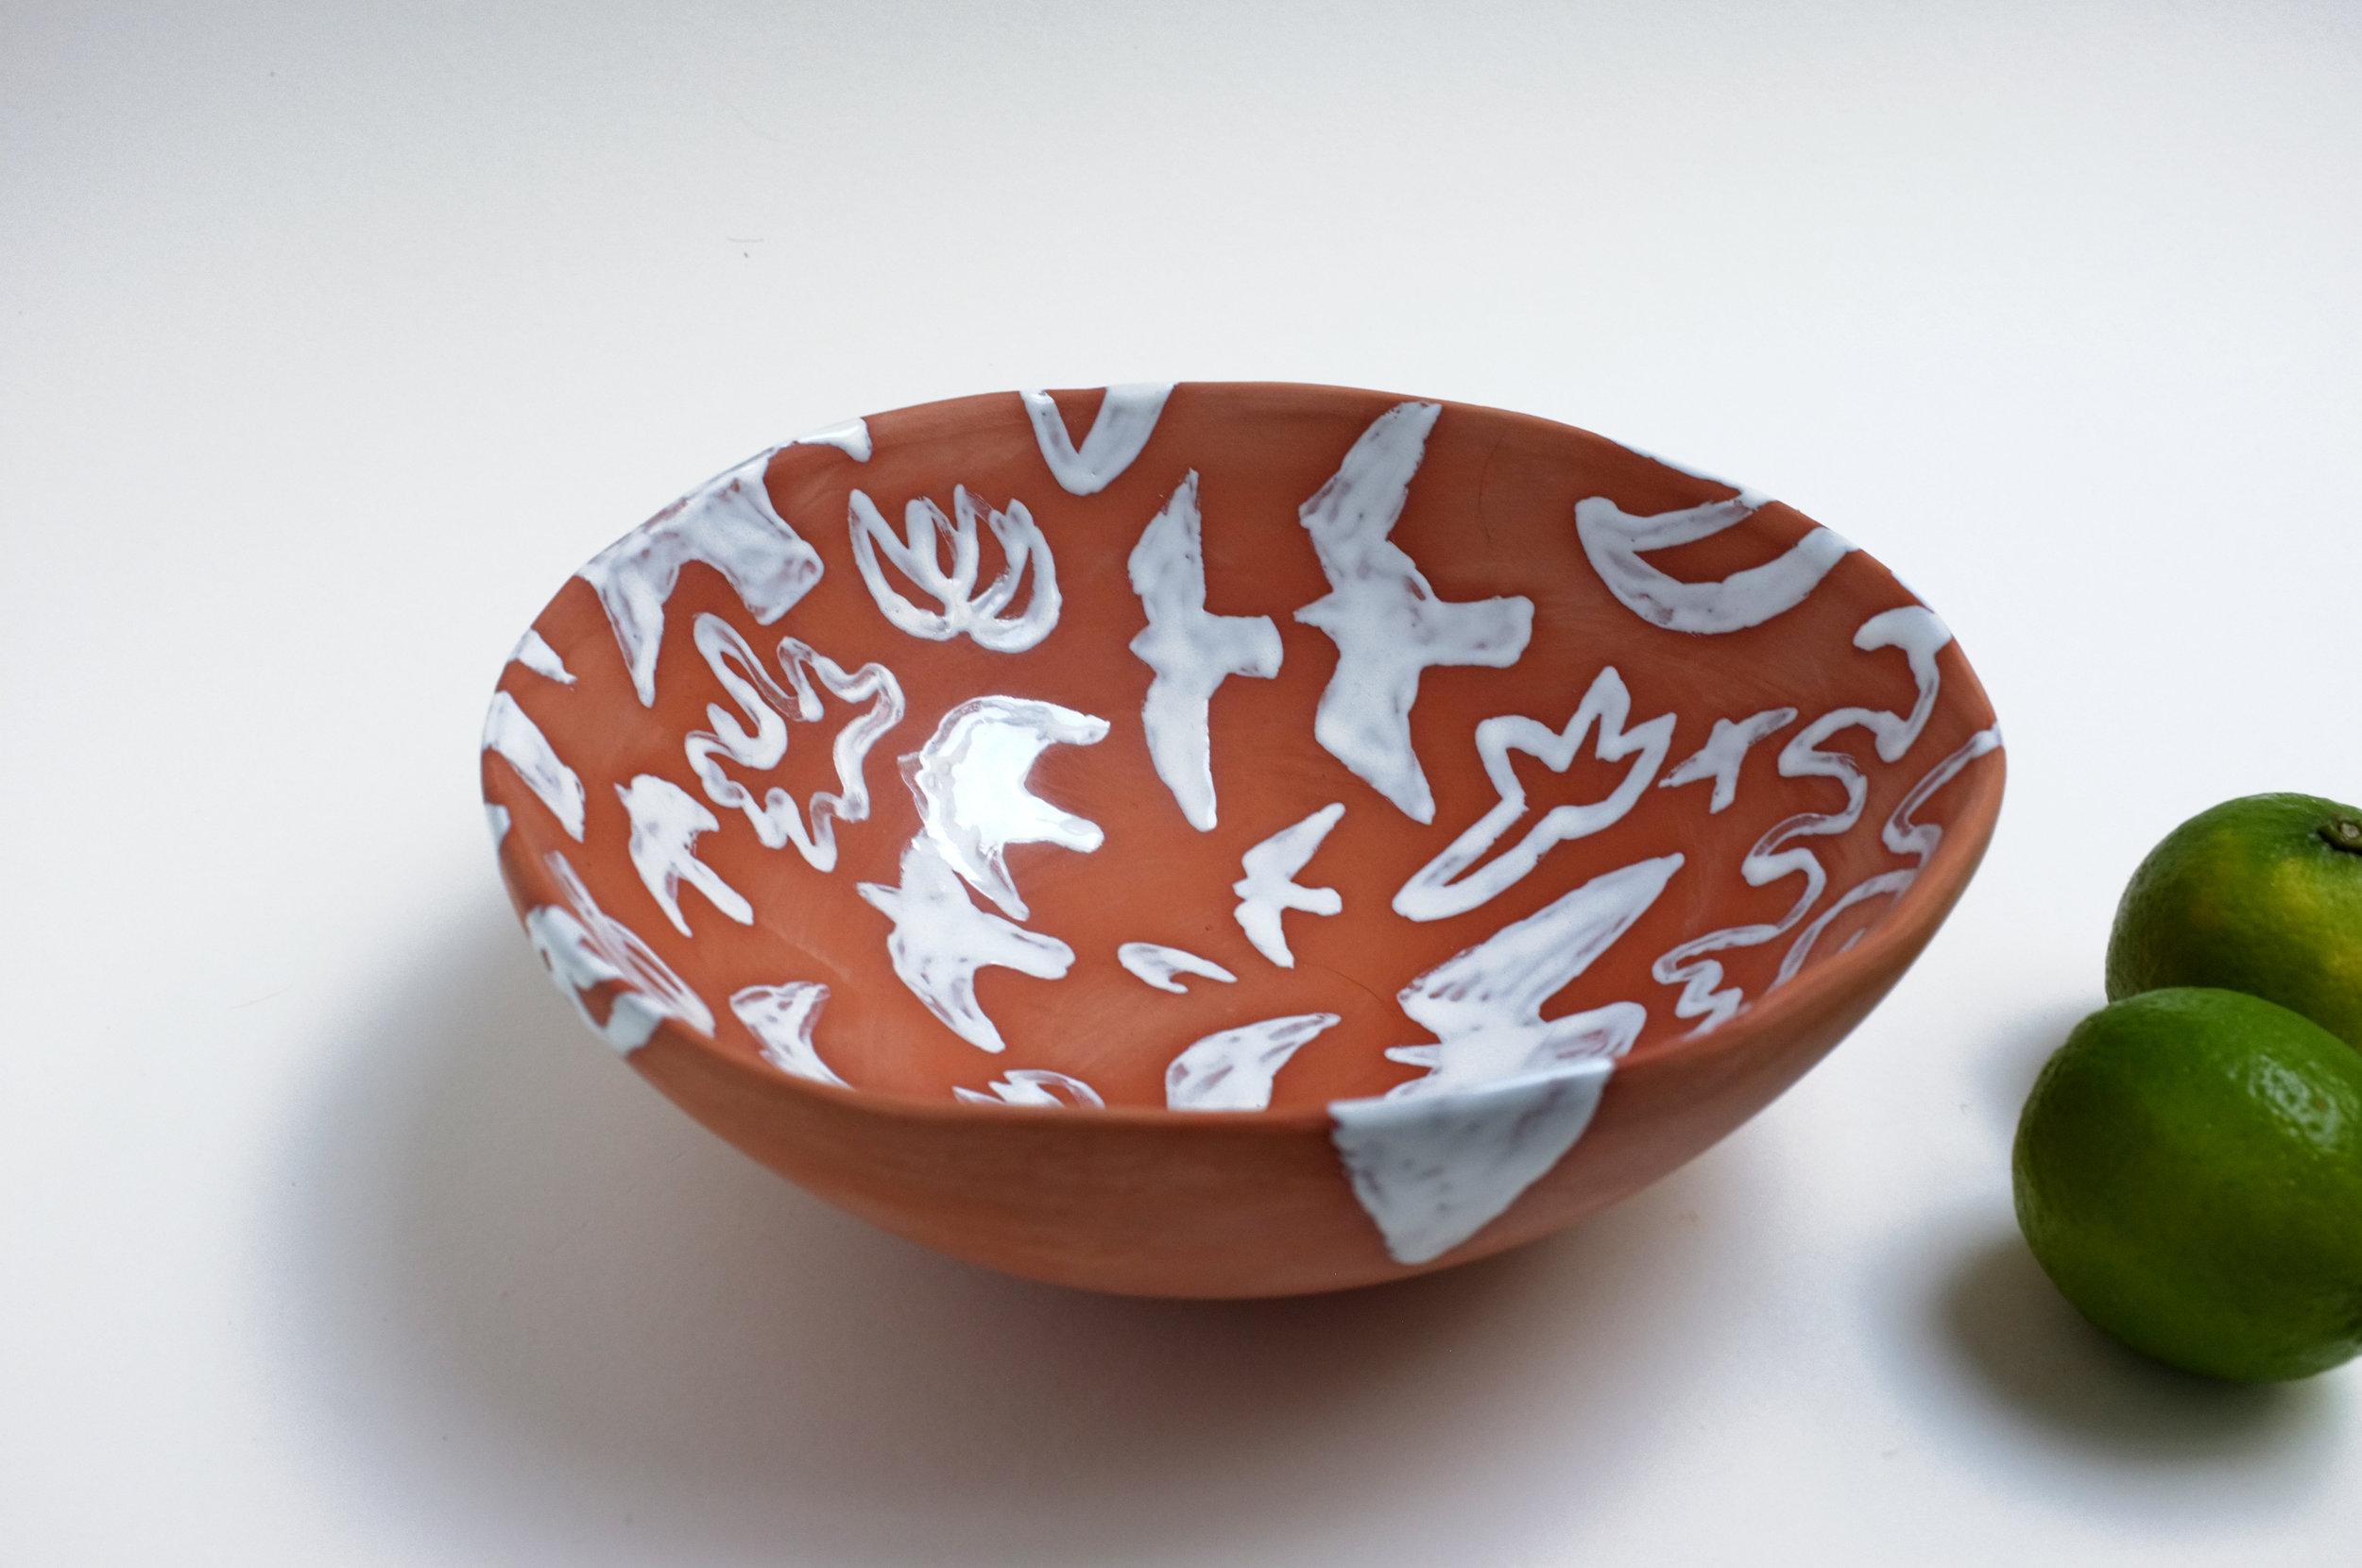 White-birds-terracotta-plate_Ingaga-2.jpg